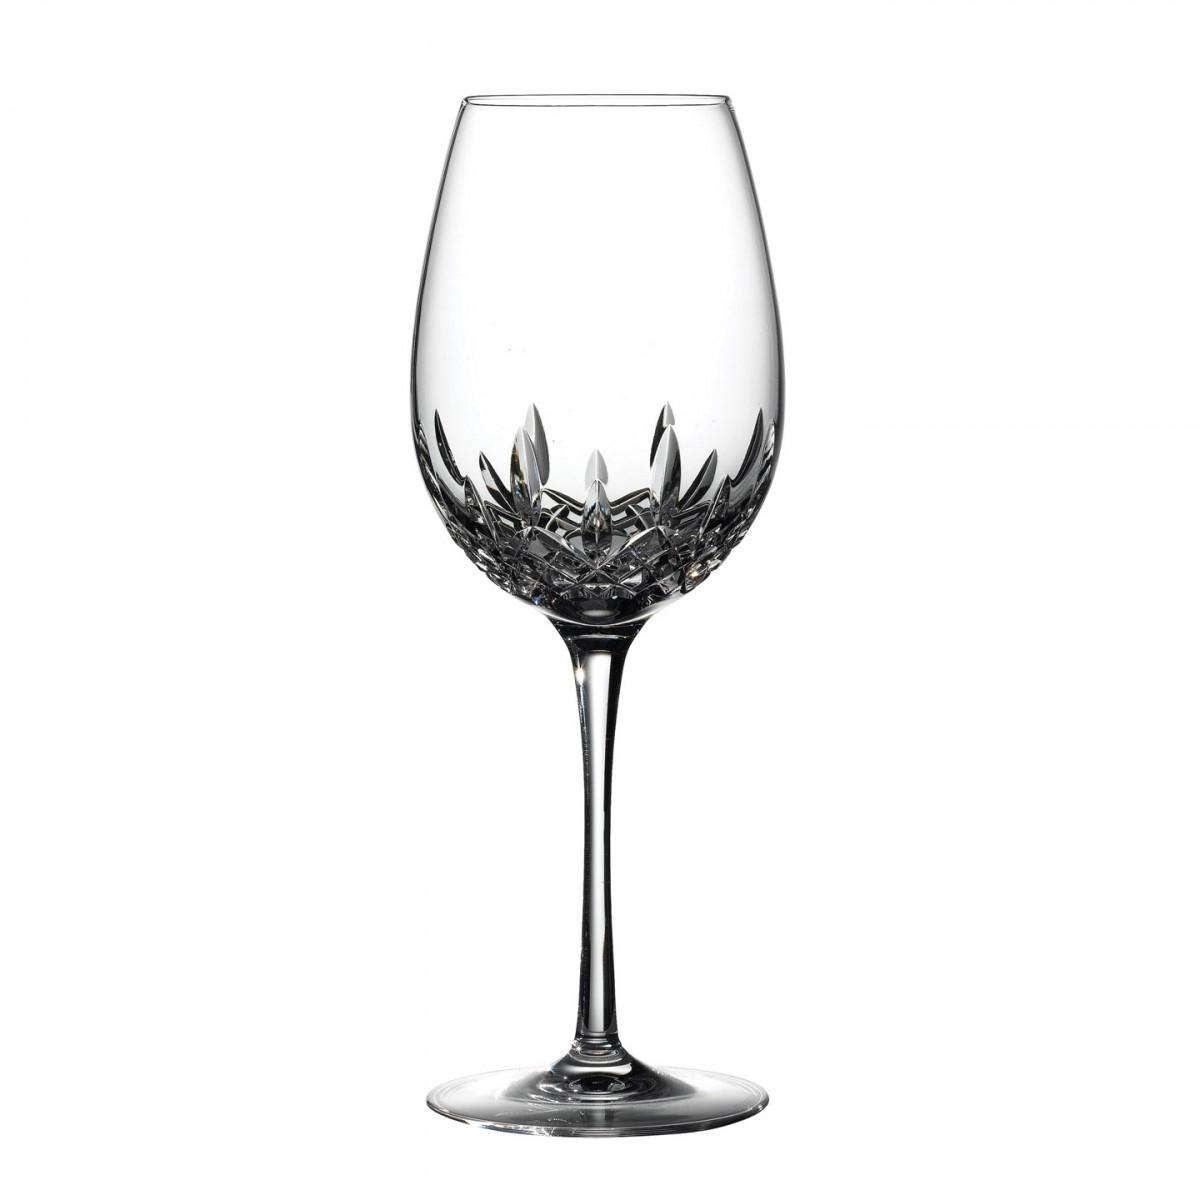 waterford-lismore-essence-red-wine-goblet-024258415058.jpg